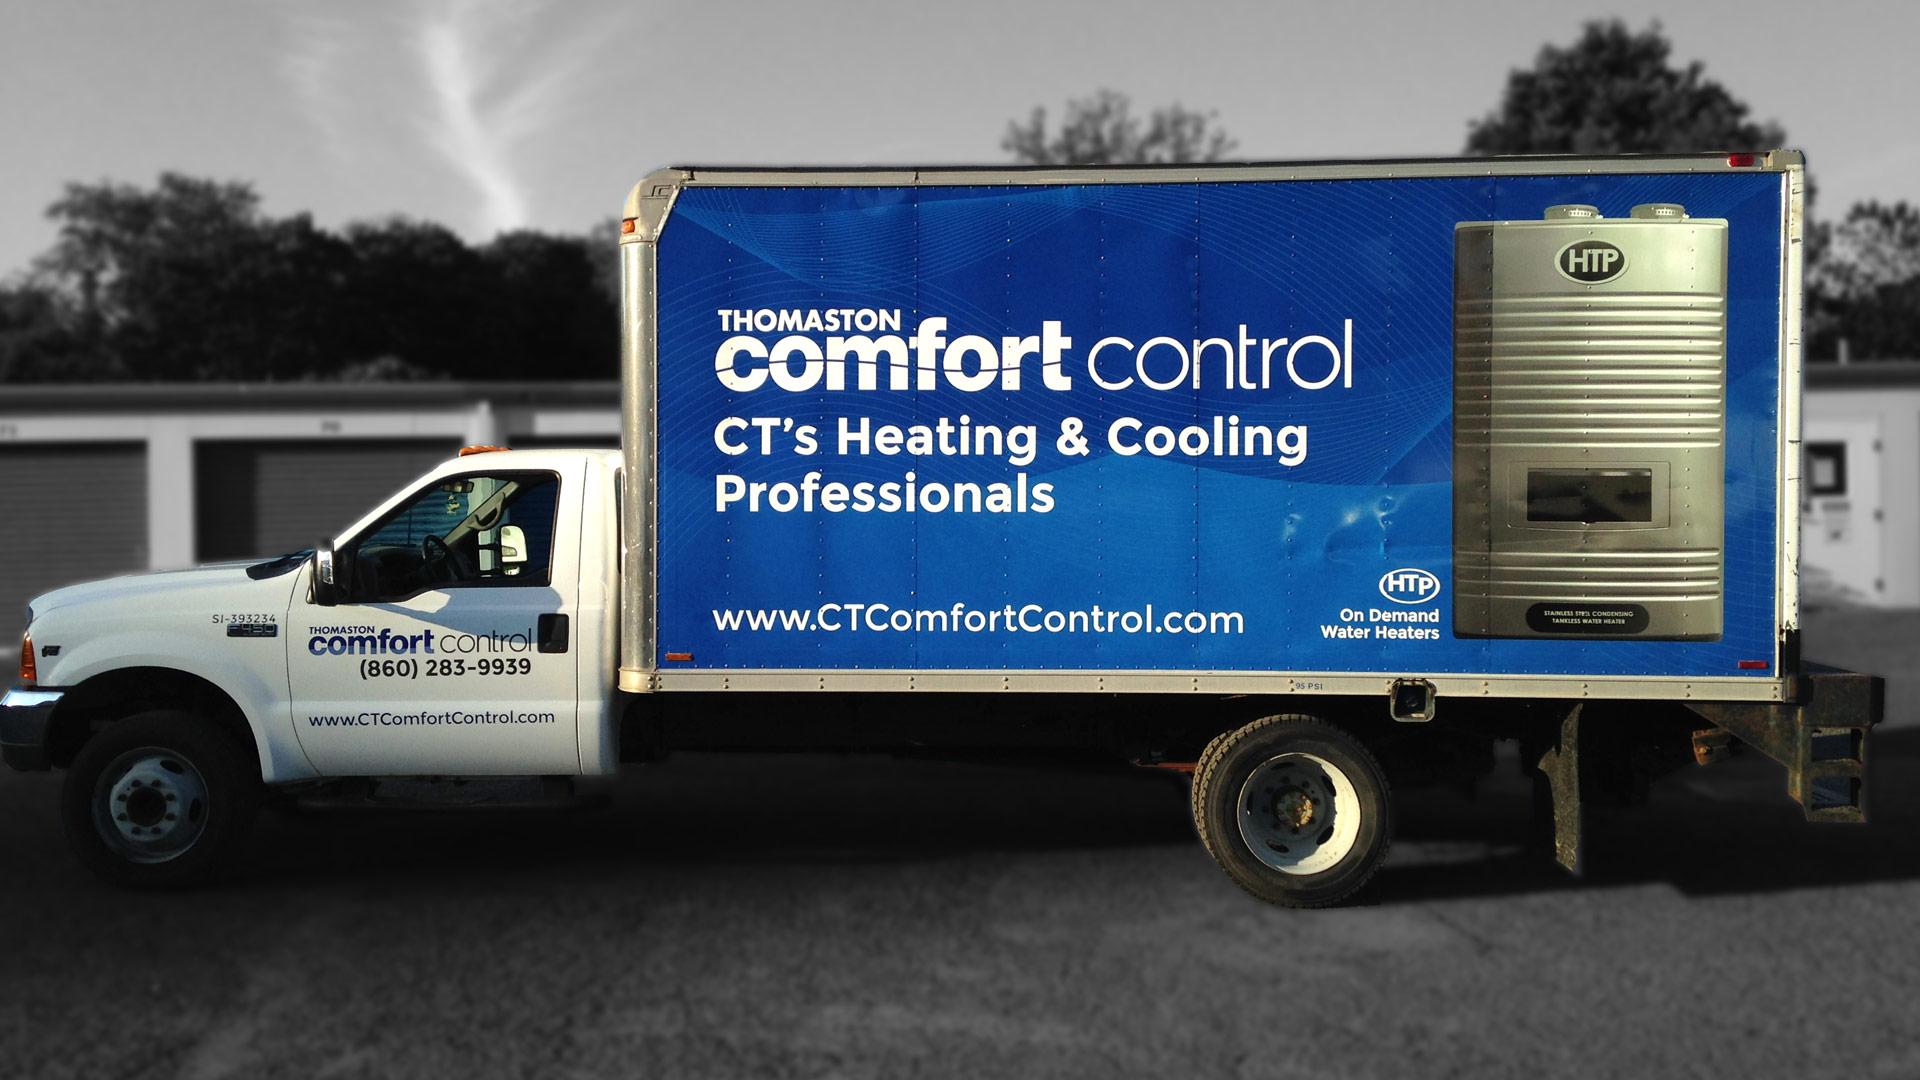 Thomaston Comfort Control